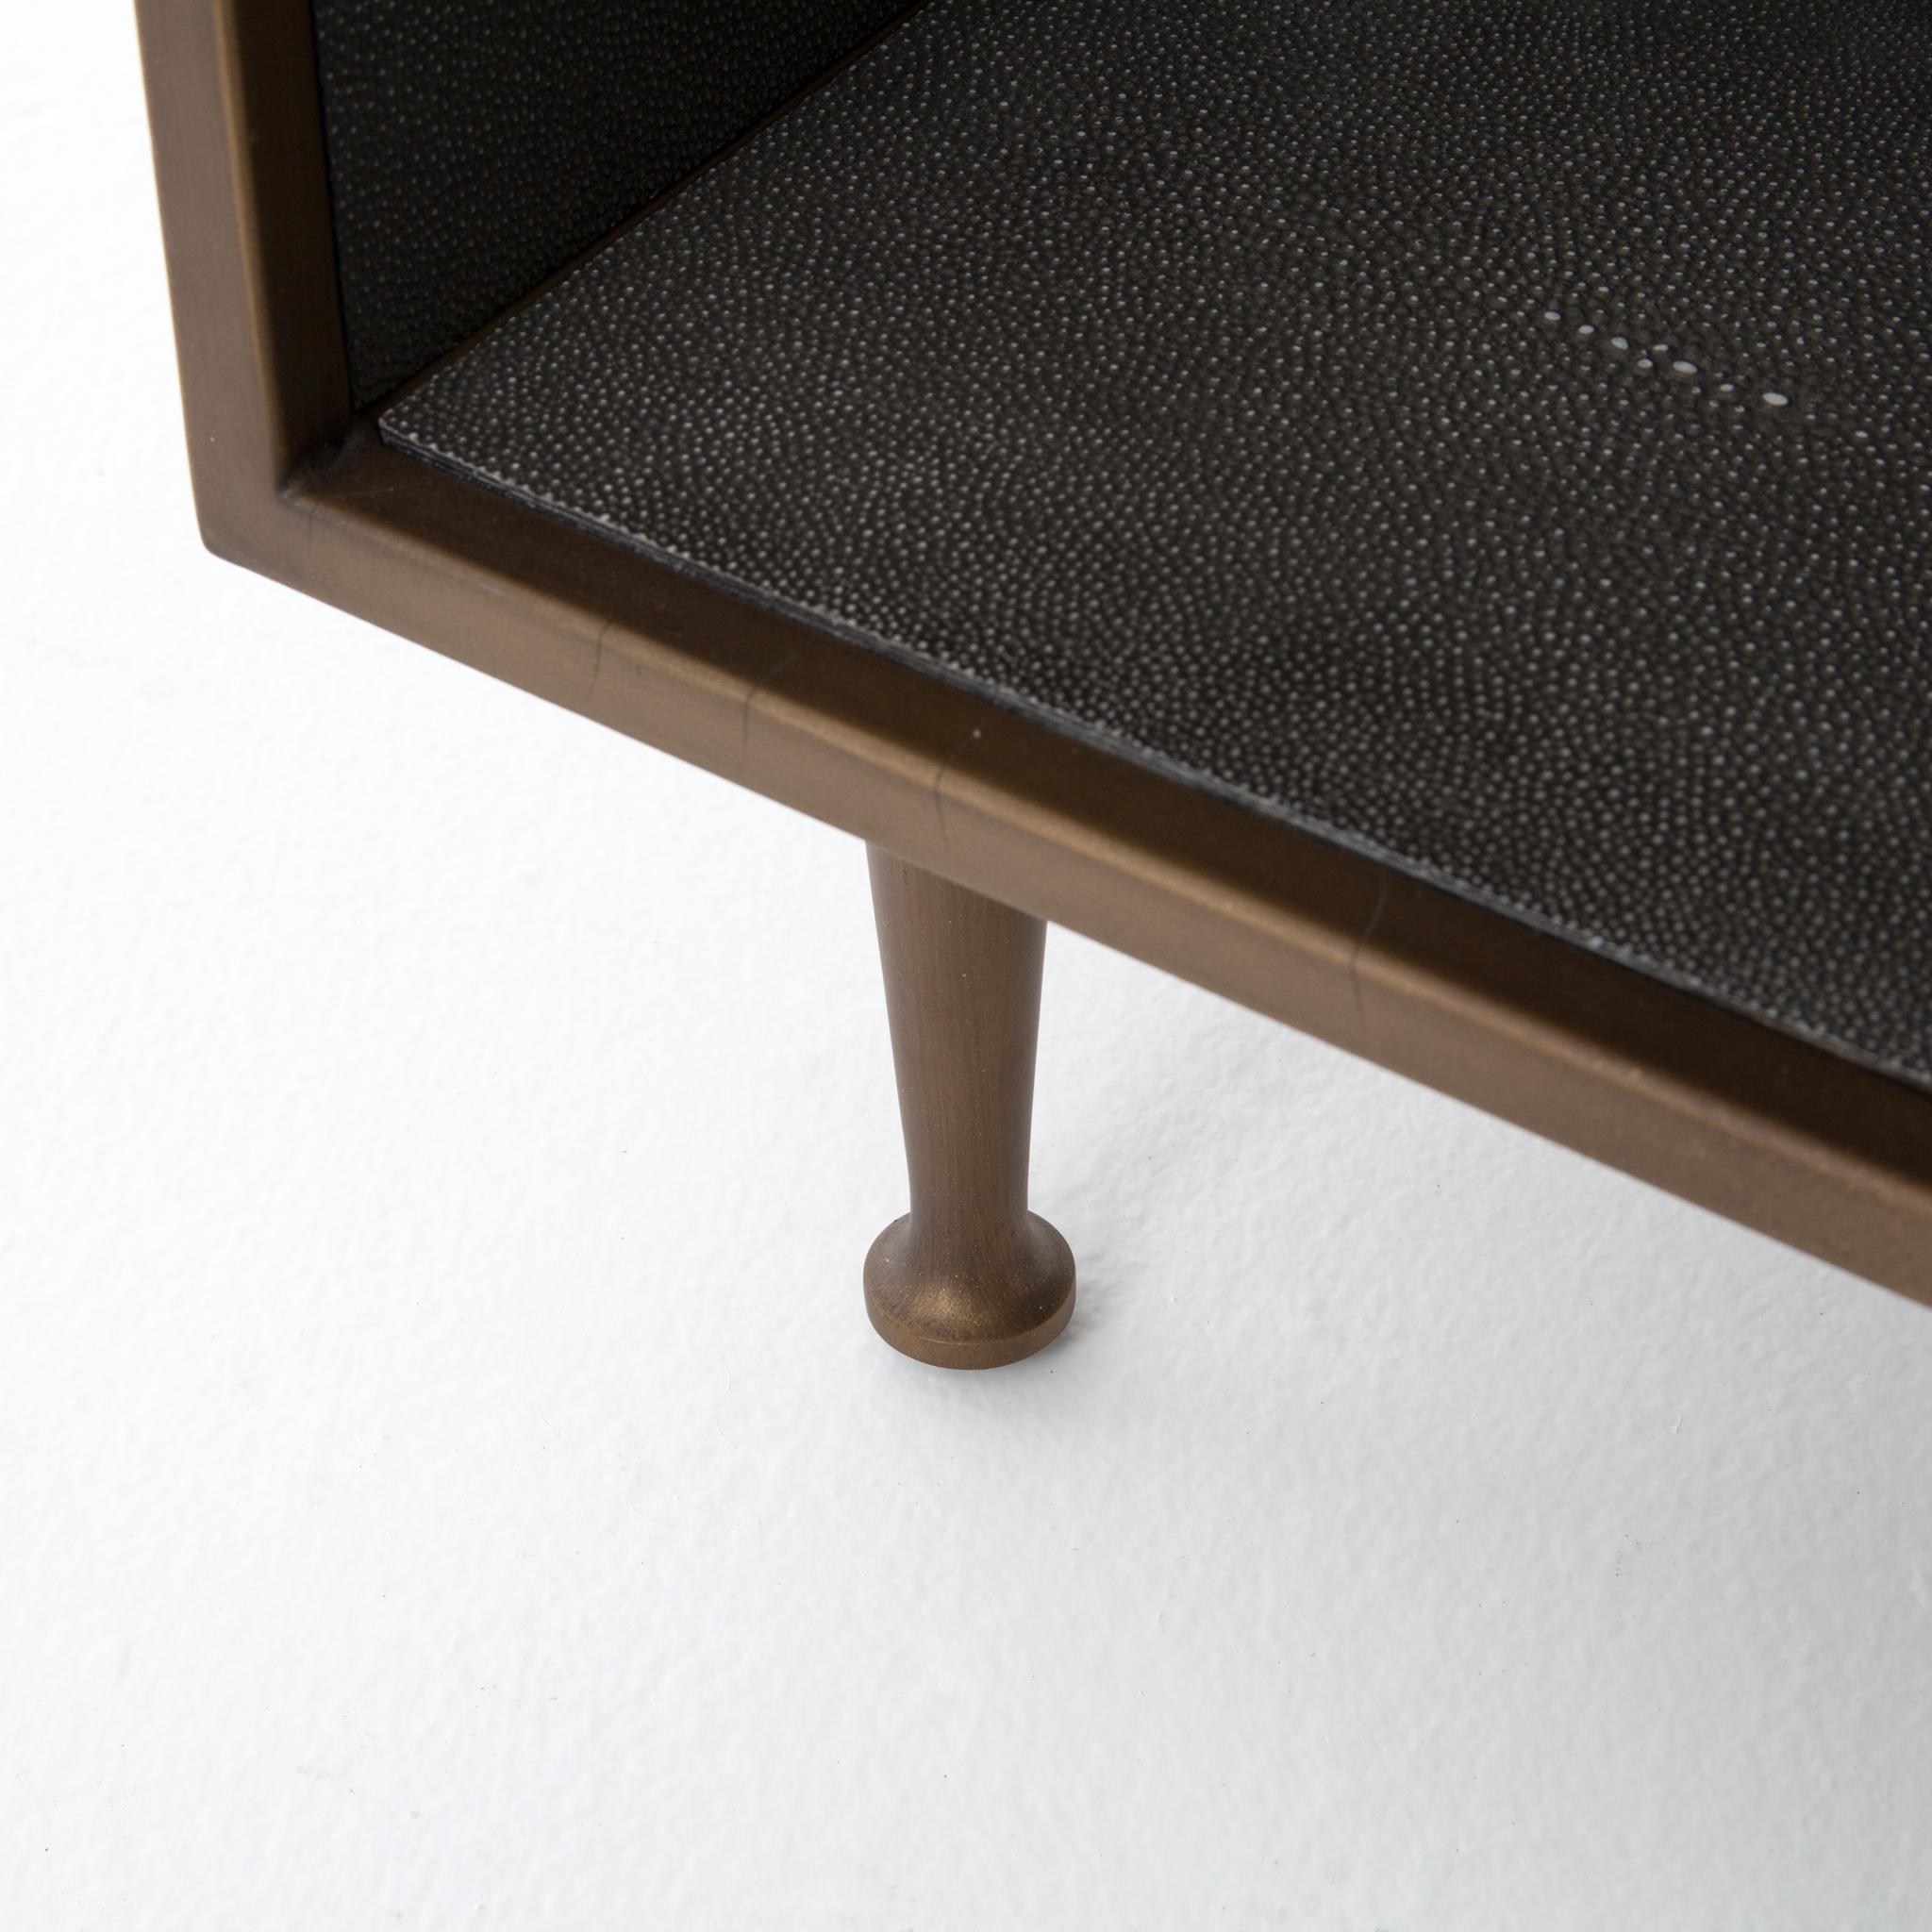 bc7d995e2990c Shagreen Bedside Table - Paysage